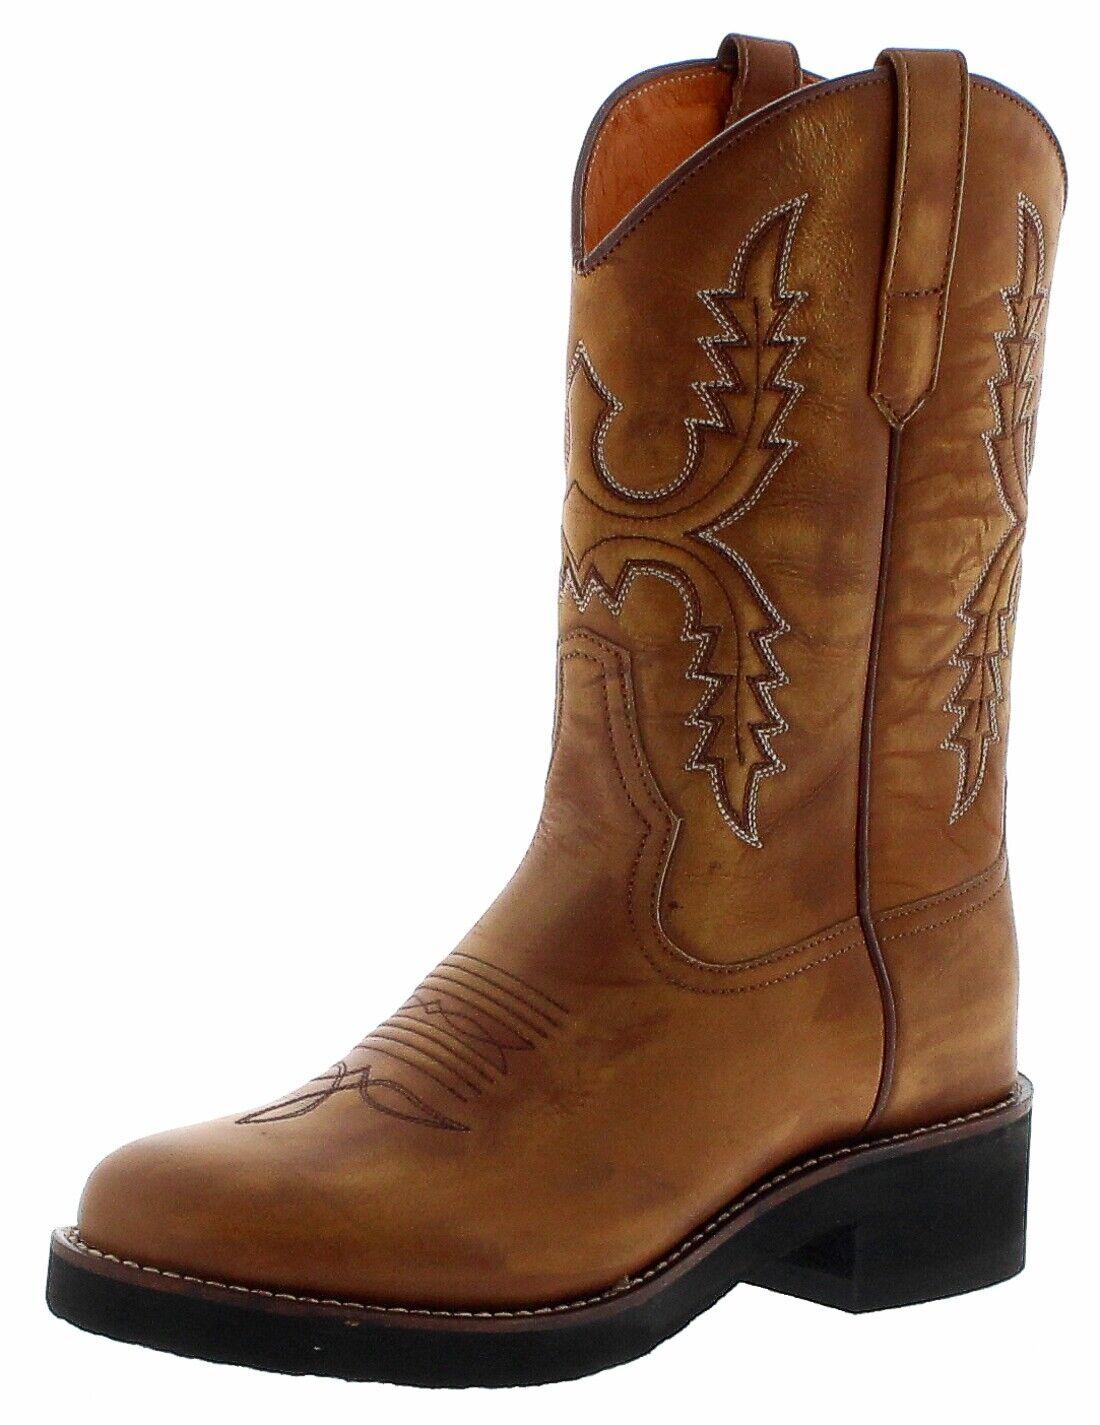 Sendra stivali 11615 Siena Cowboy Da Donna Stivali Stivali Western MONTALA Marronee